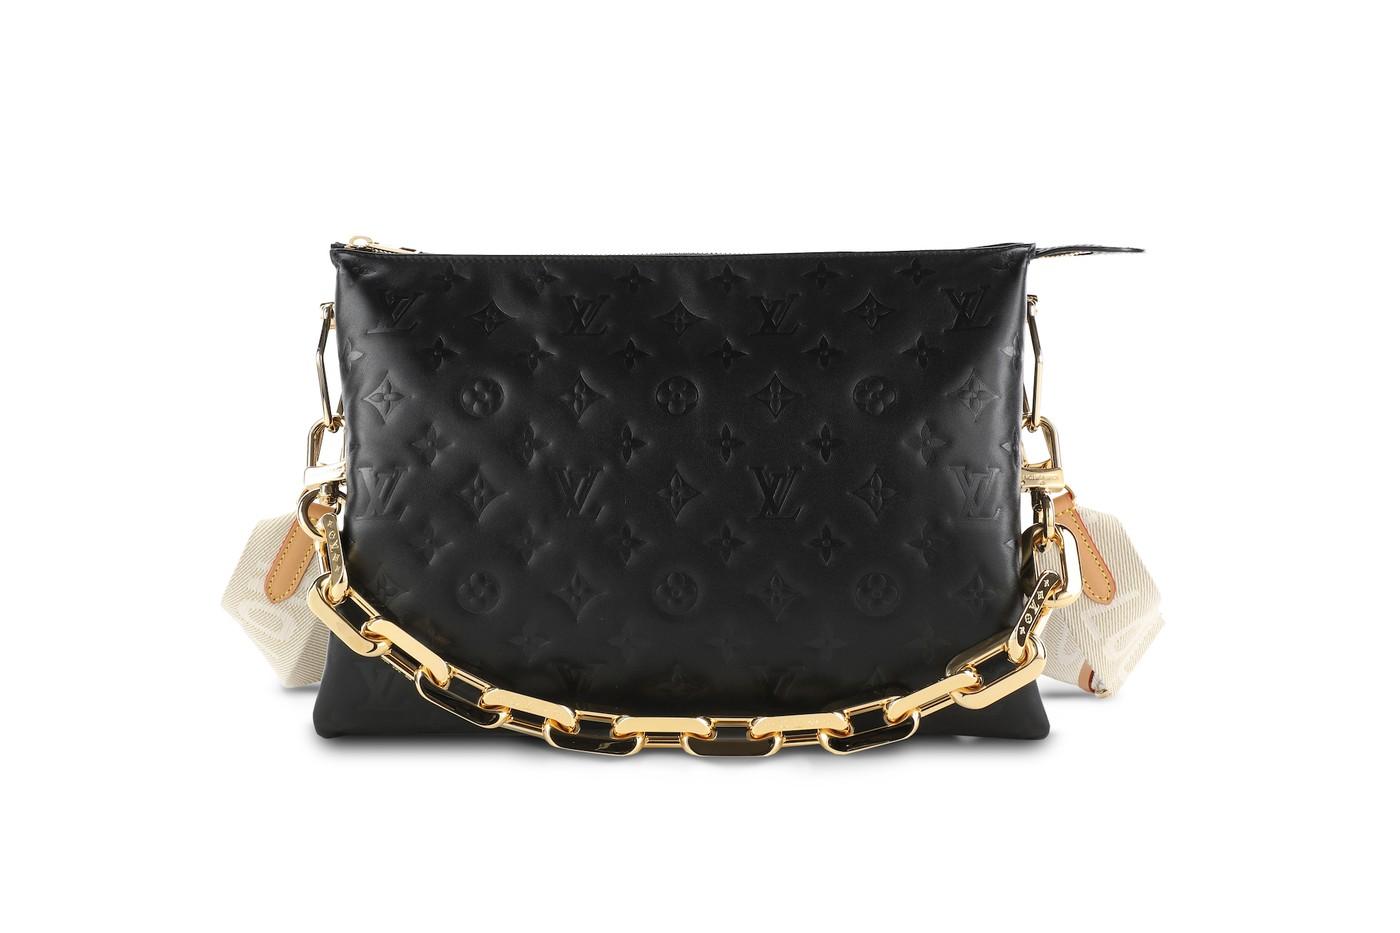 Louis vuitton monogram chain bags 2021 ss handbags collection